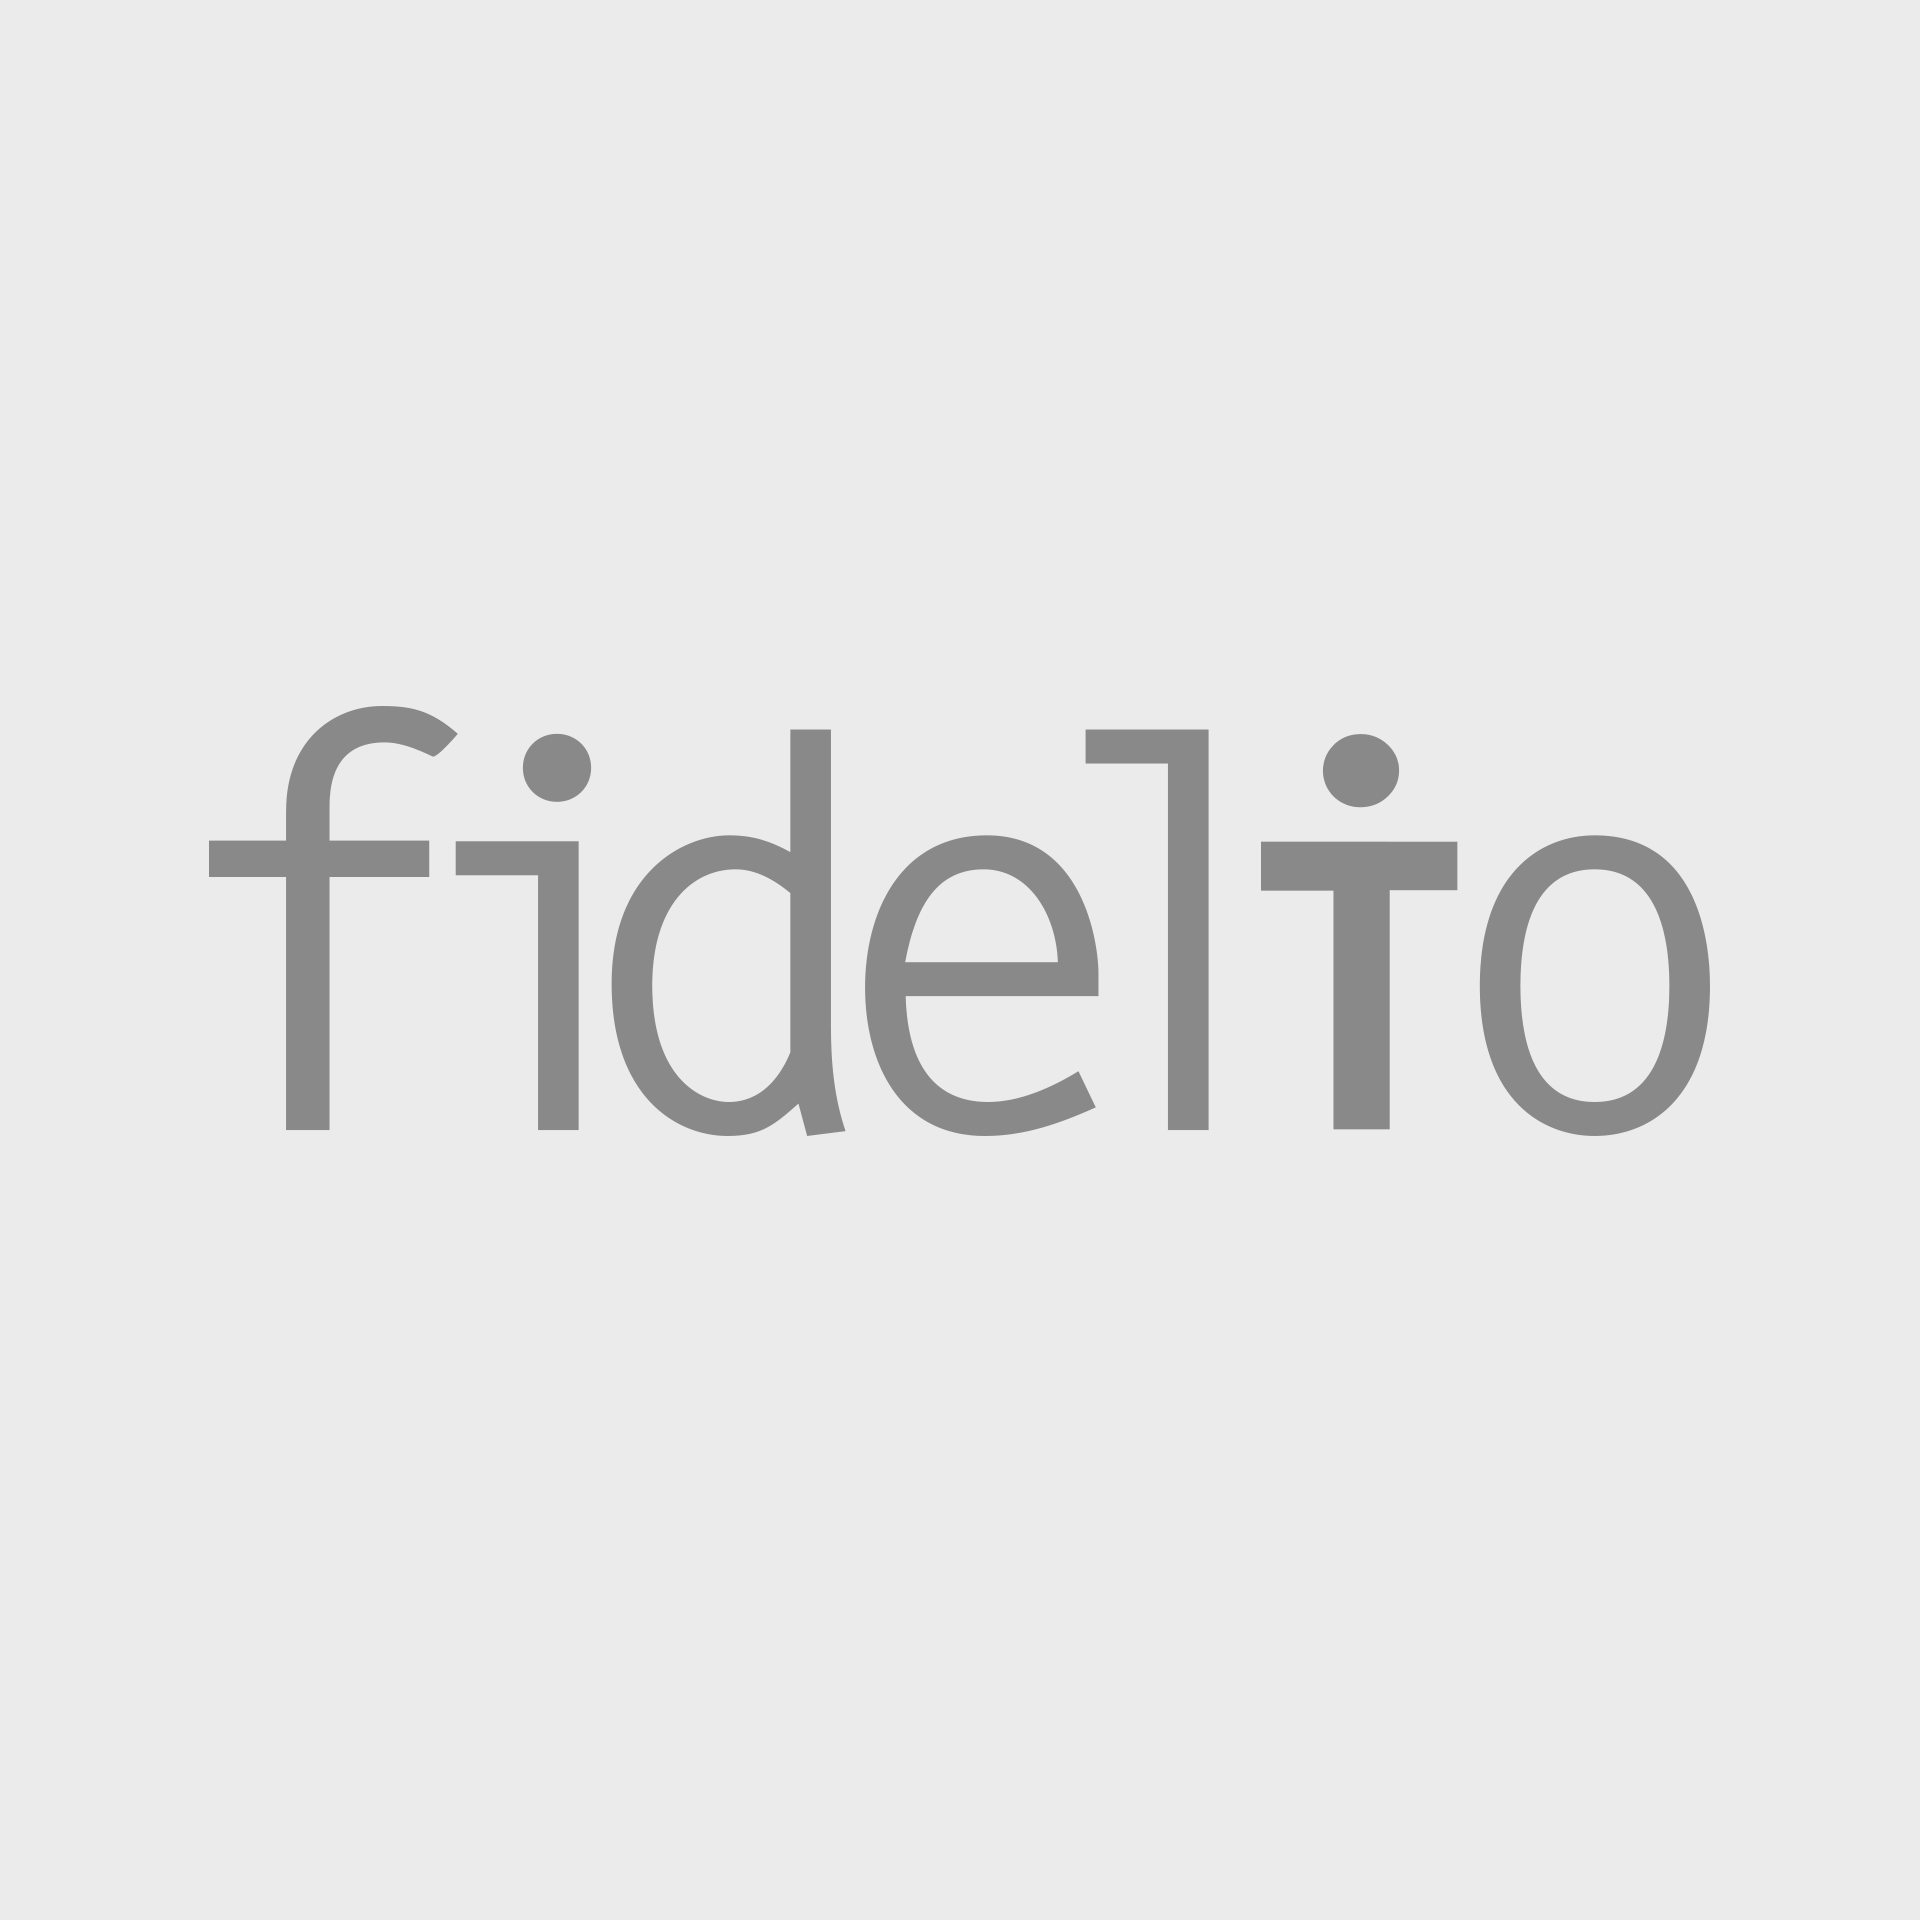 Rudolf Péter a kulisszák mögött - Galéria